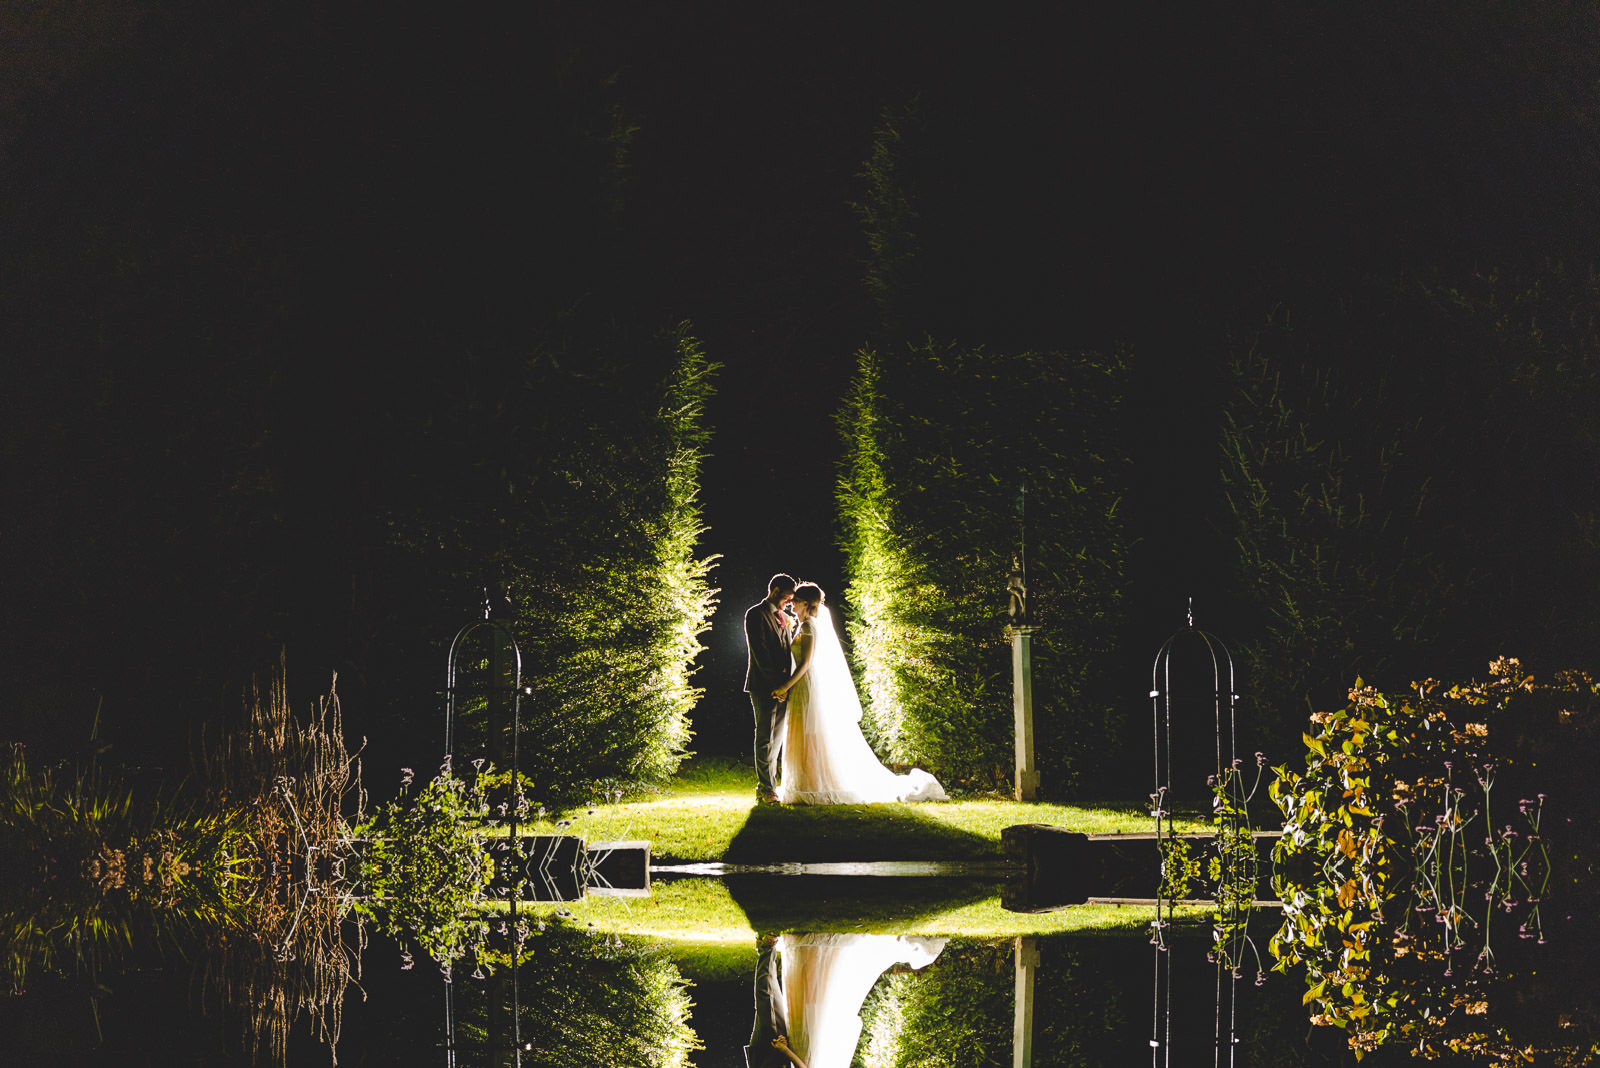 Miskin Manor Wedding Photography - Art by Design Photography - Flash portrait